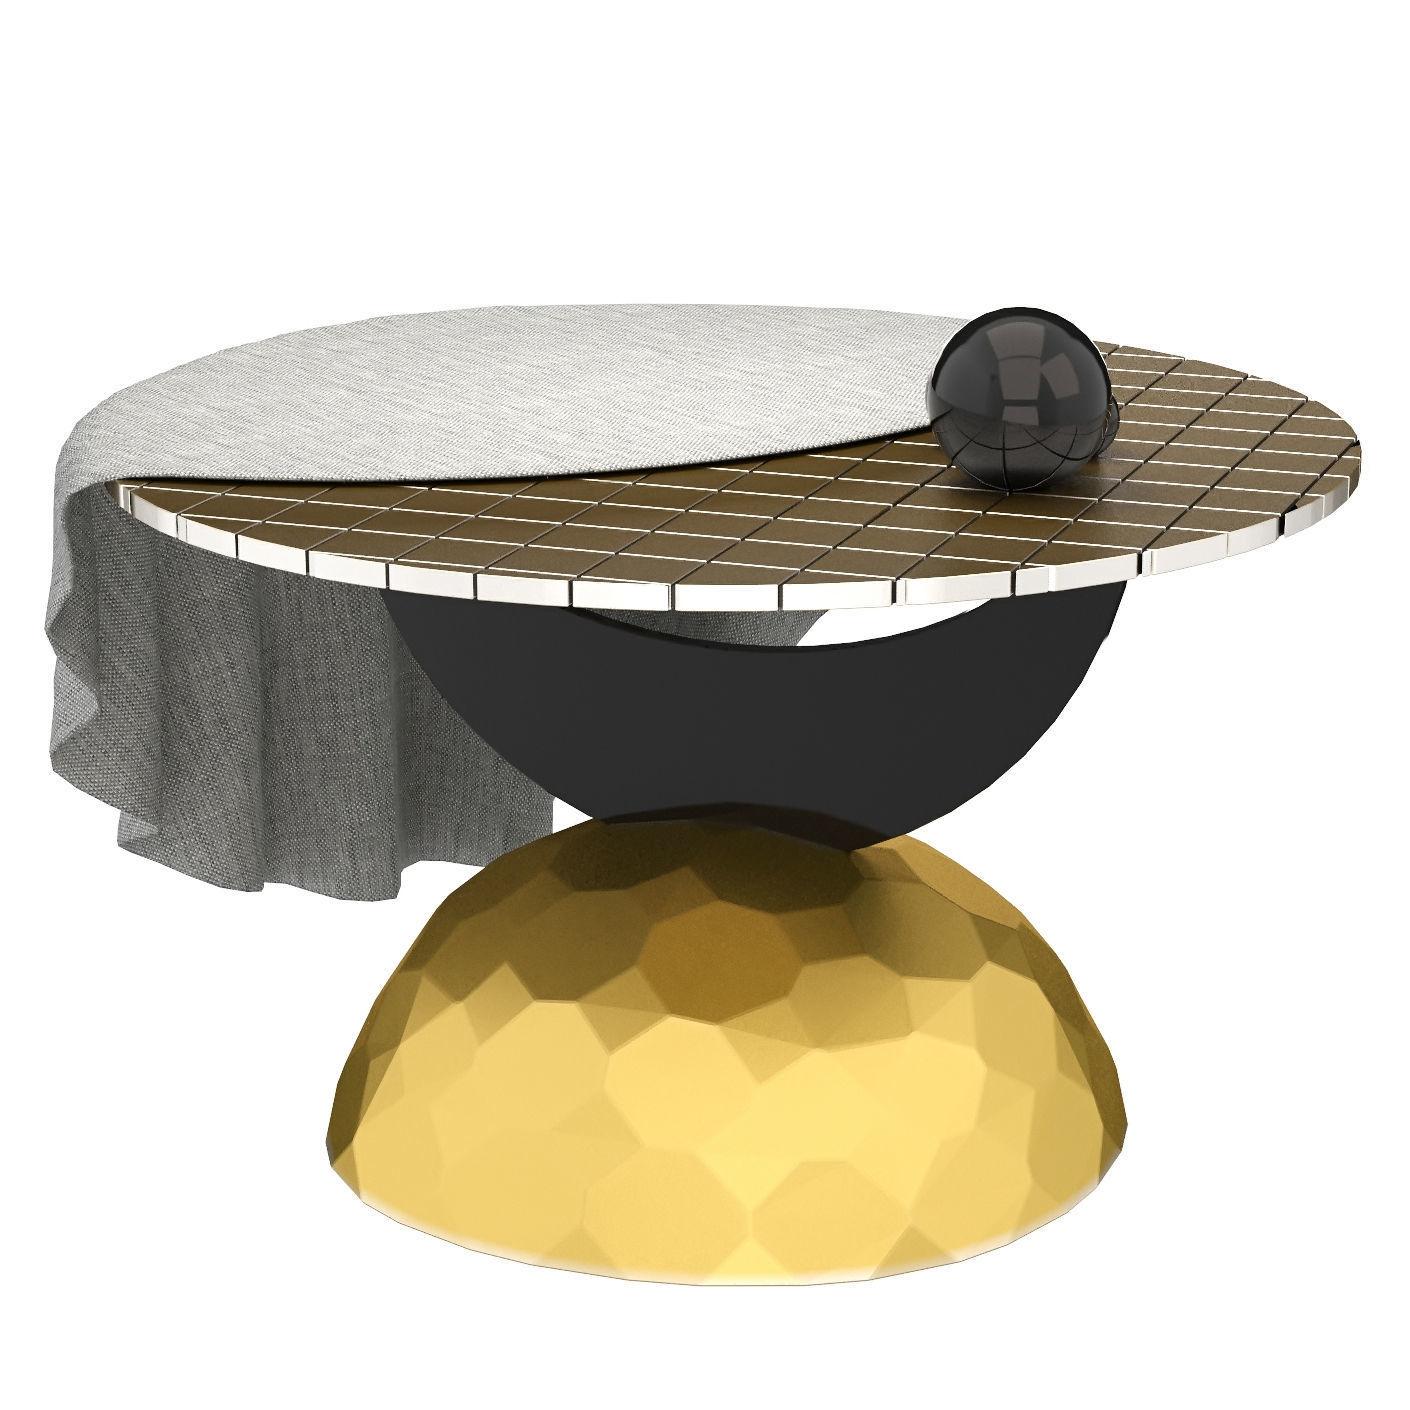 Merveilleux ... Half Moon Coffee Table 3d Model Max Obj Fbx Mtl 5 ...